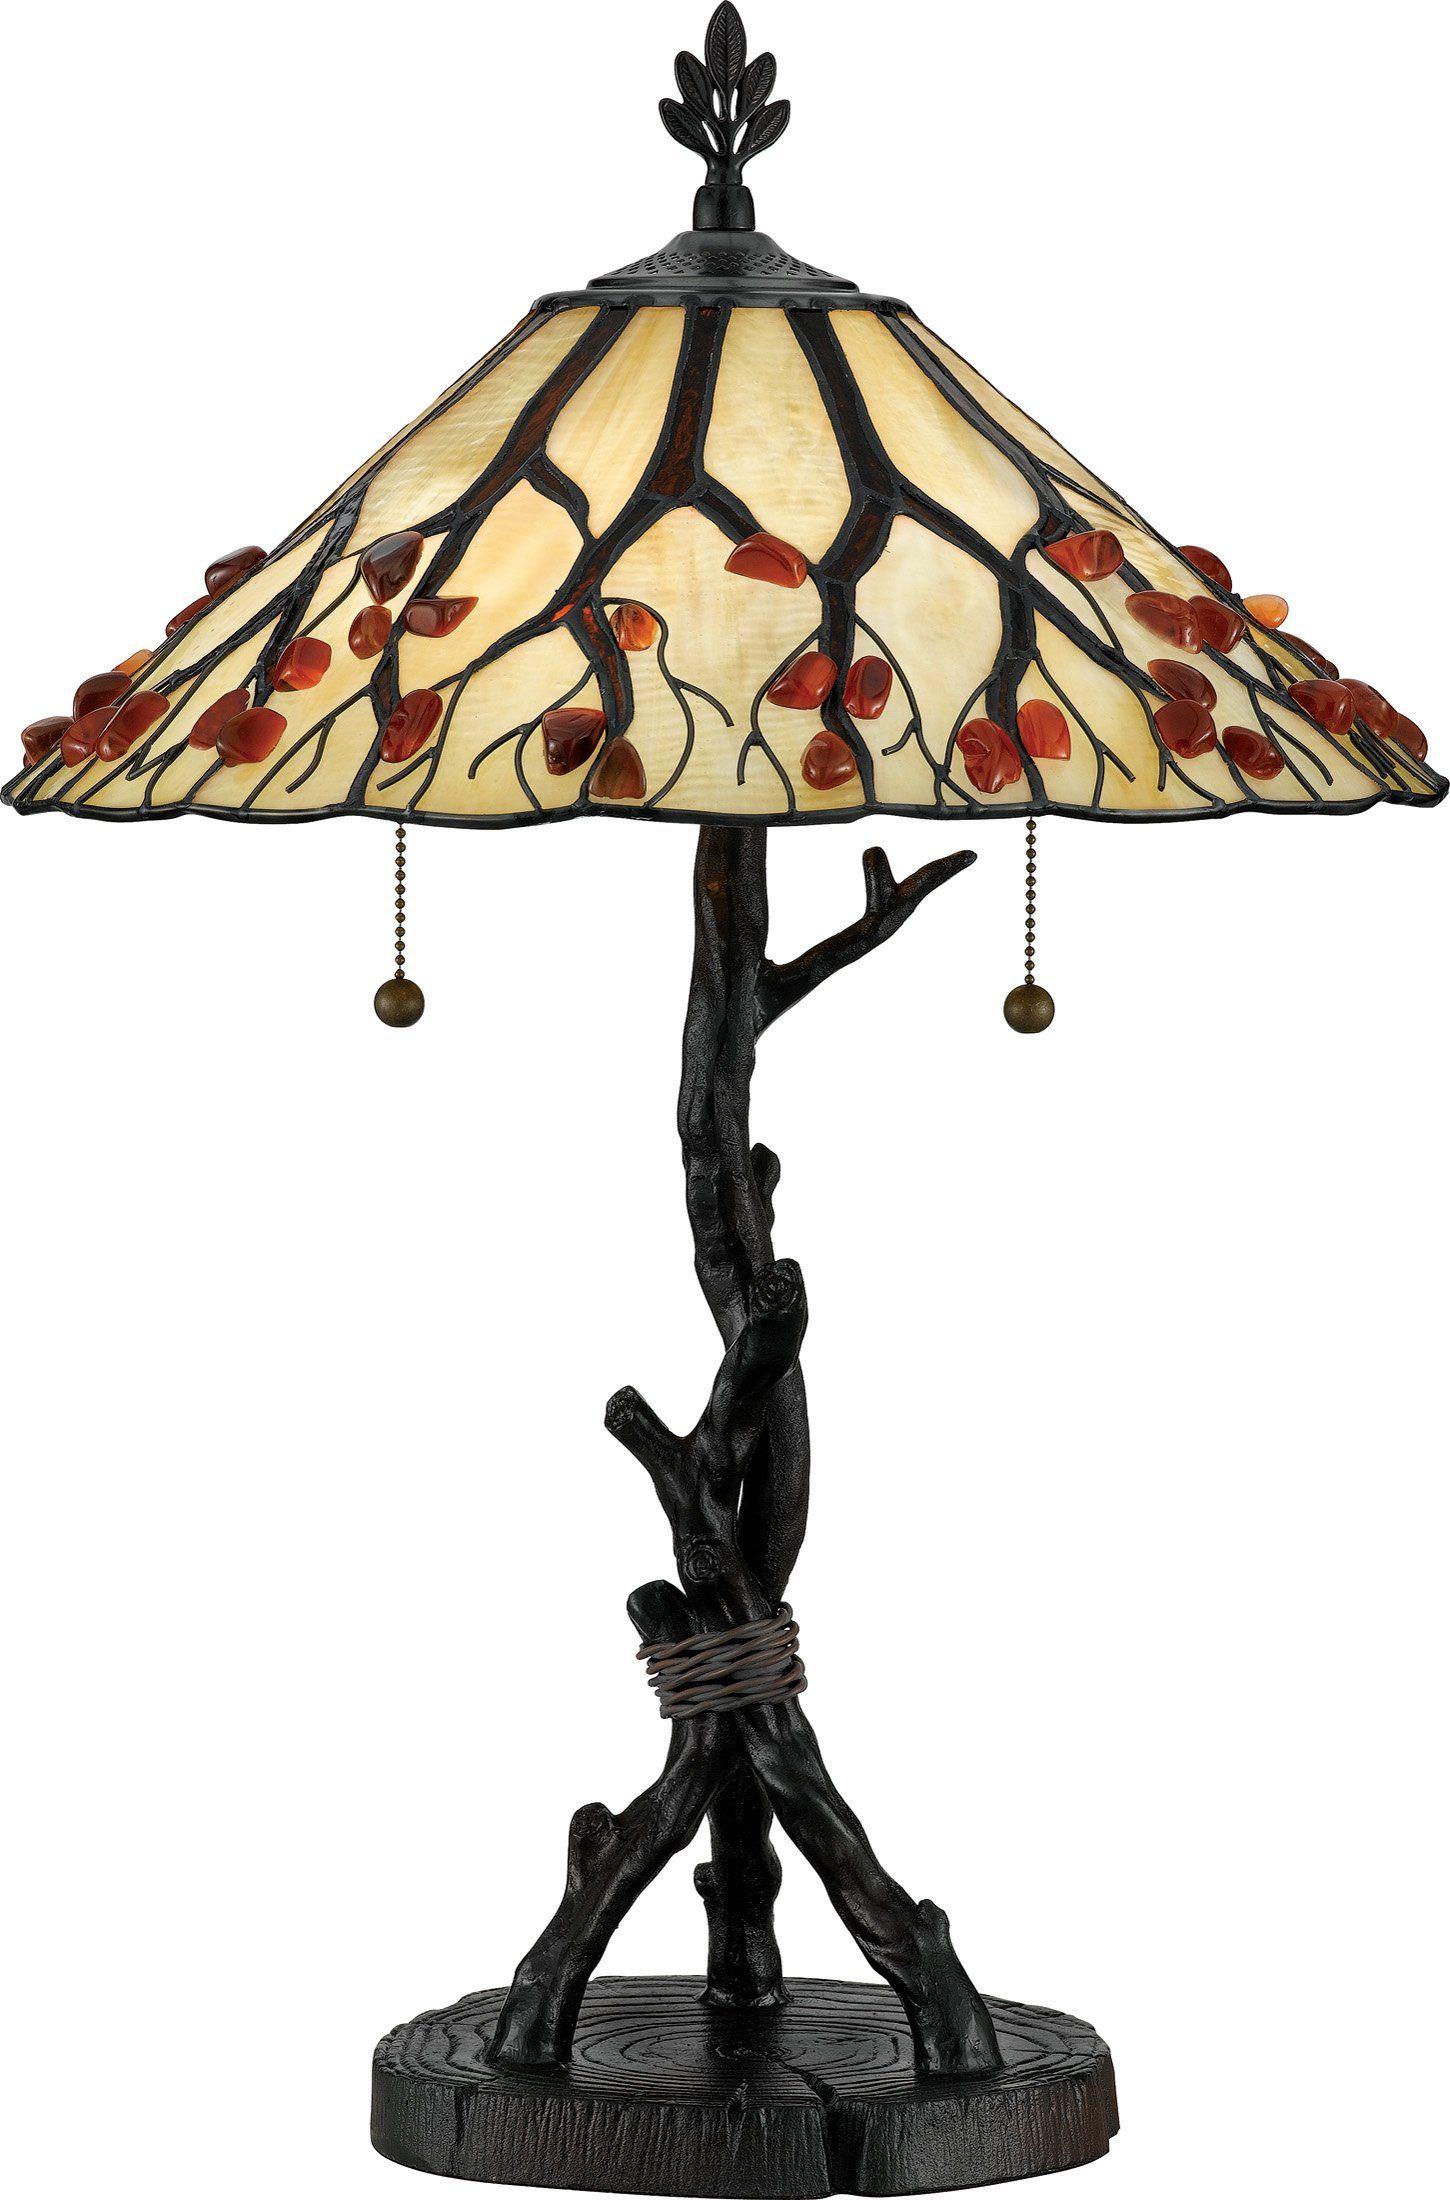 Quoizel ag711tva whispering wood 25 inch tiffany table lamp valiant bronze